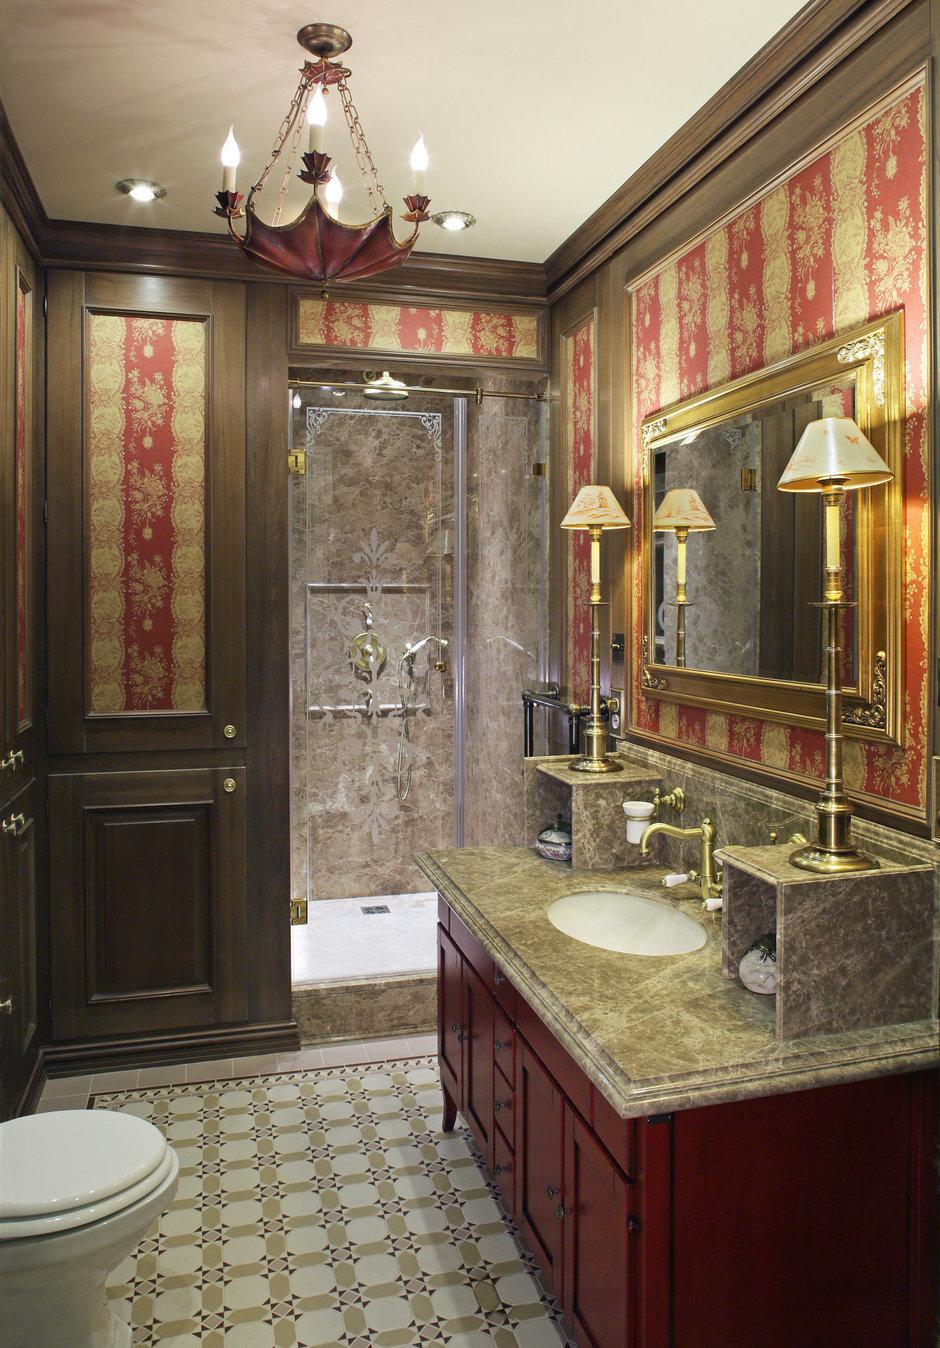 Фотография: Ванная в стиле Прованс и Кантри, Классический, Квартира, Дома и квартиры, Проект недели – фото на InMyRoom.ru